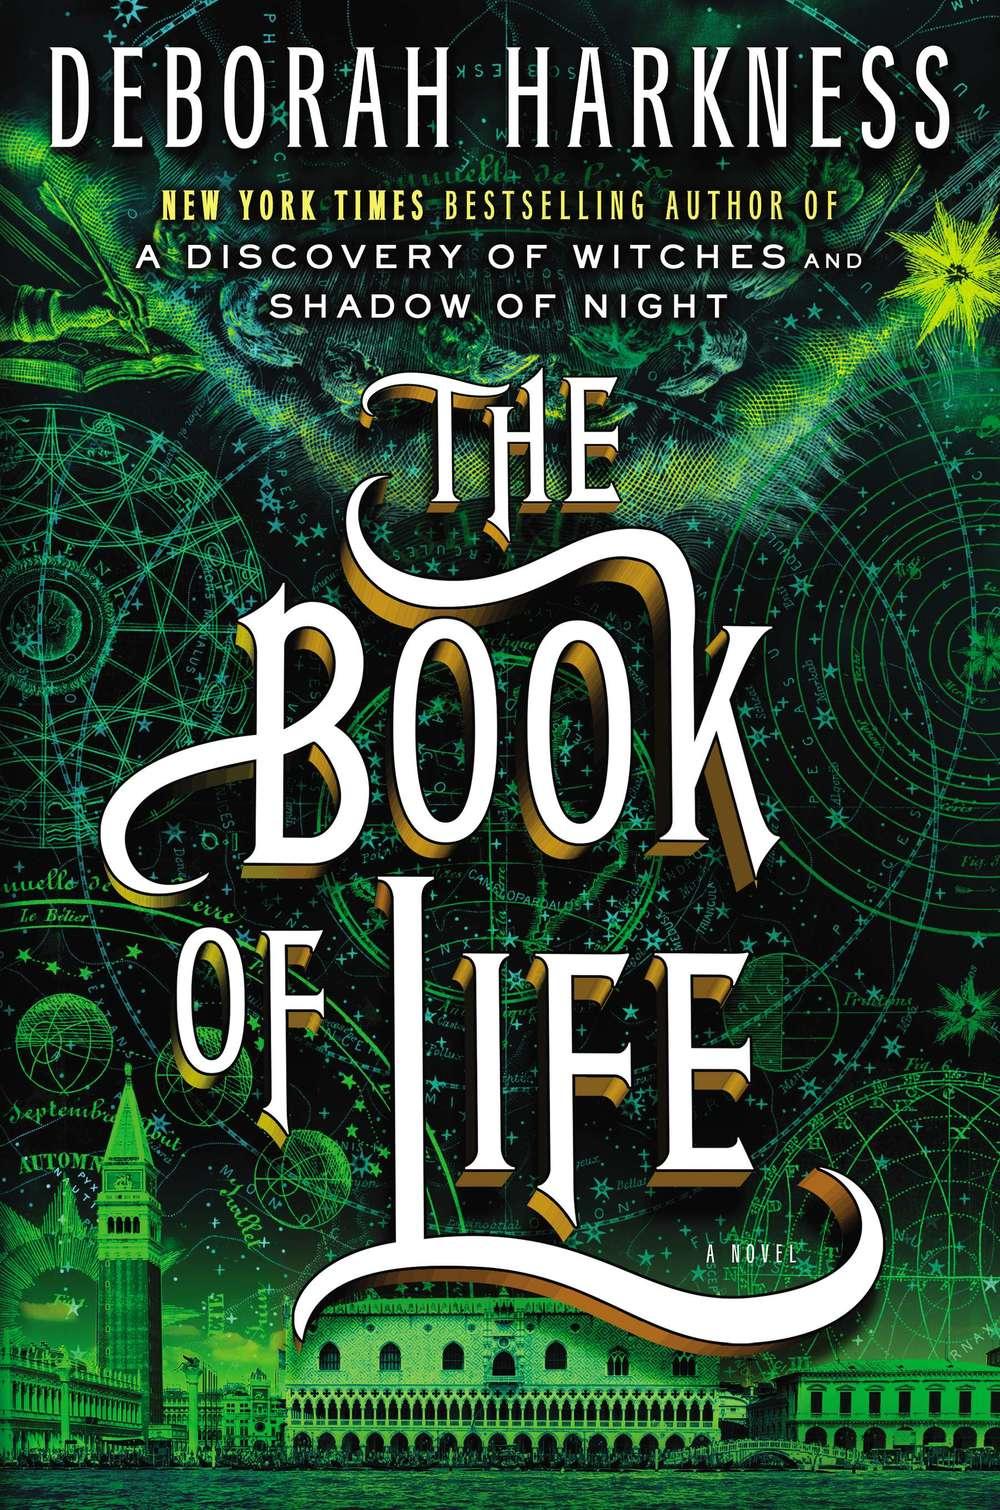 Deborah Harkness, The Book of Life, All Souls Trilogy 3 (2014)